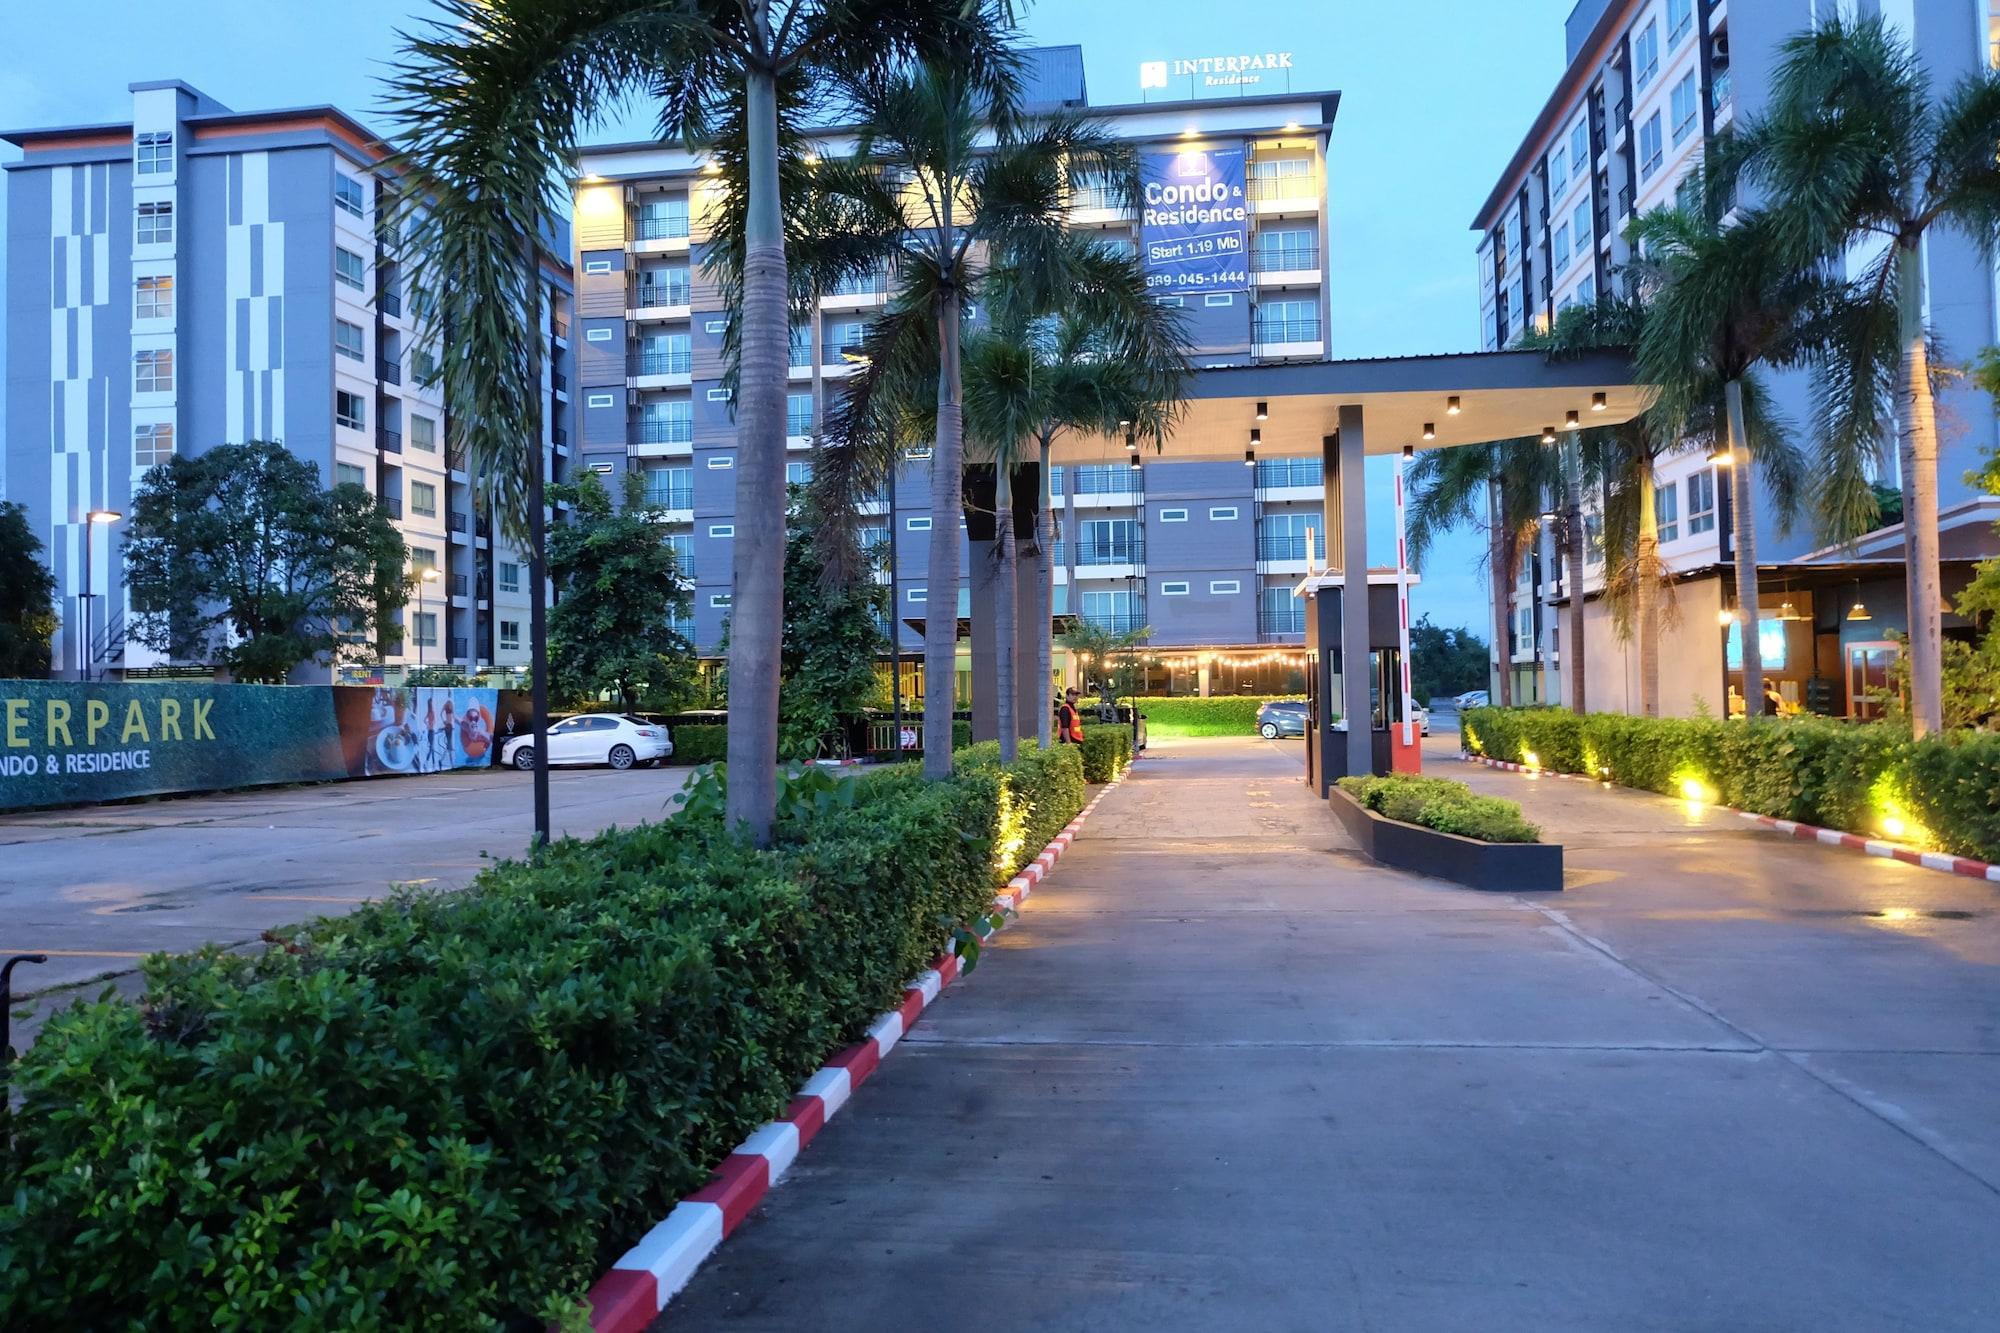 Interpark Residence Chonburi-Rayong, Pluak Daeng